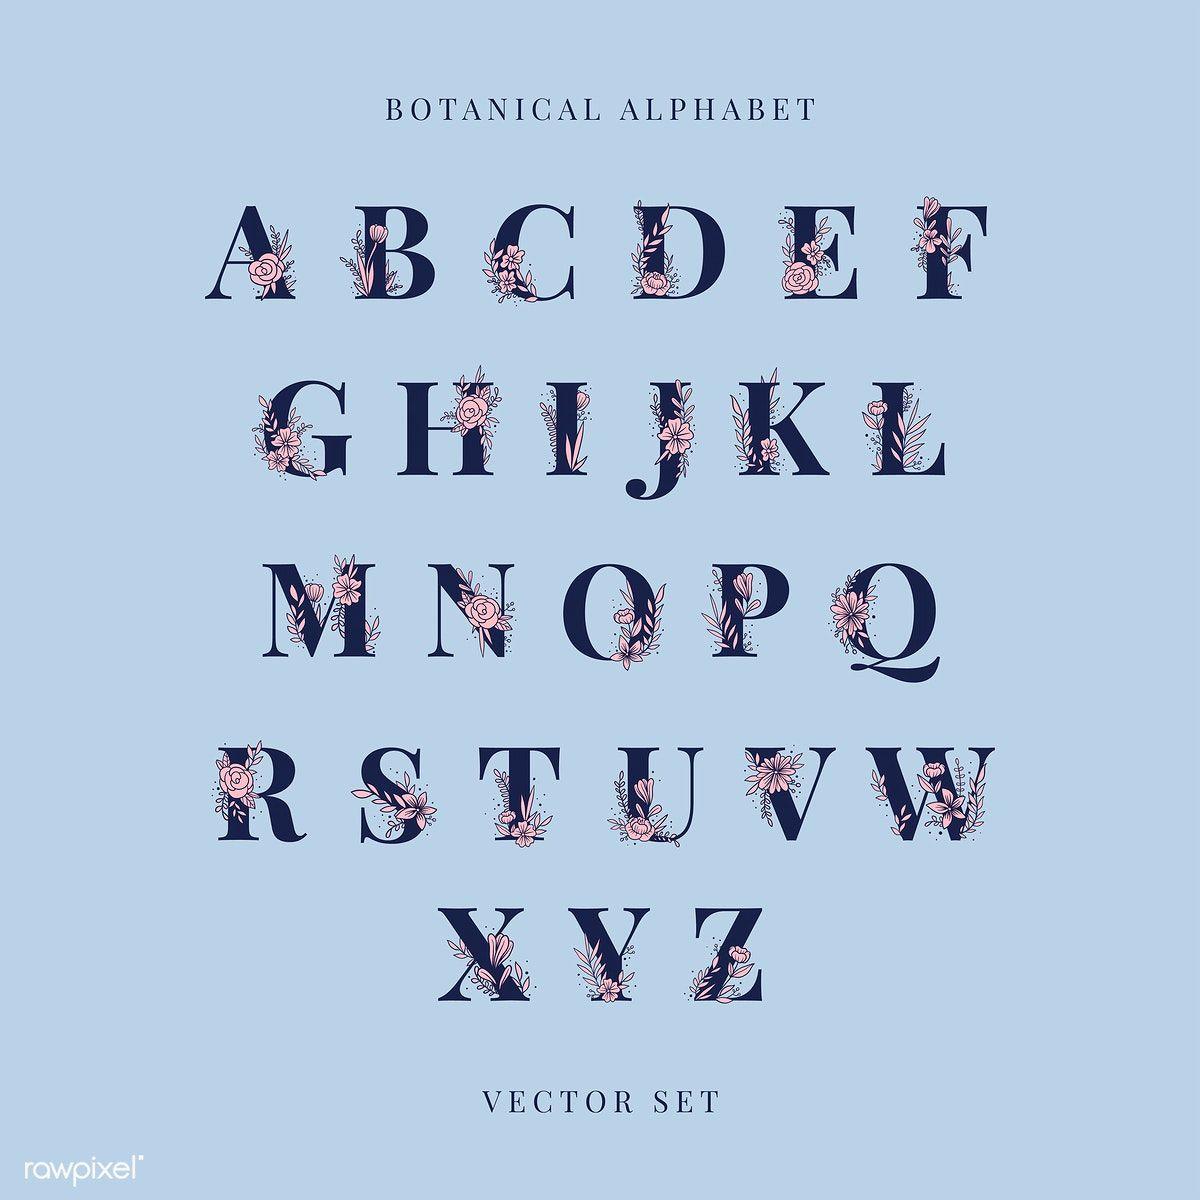 Download Premium Vector Of Botanical Alphabet Capital